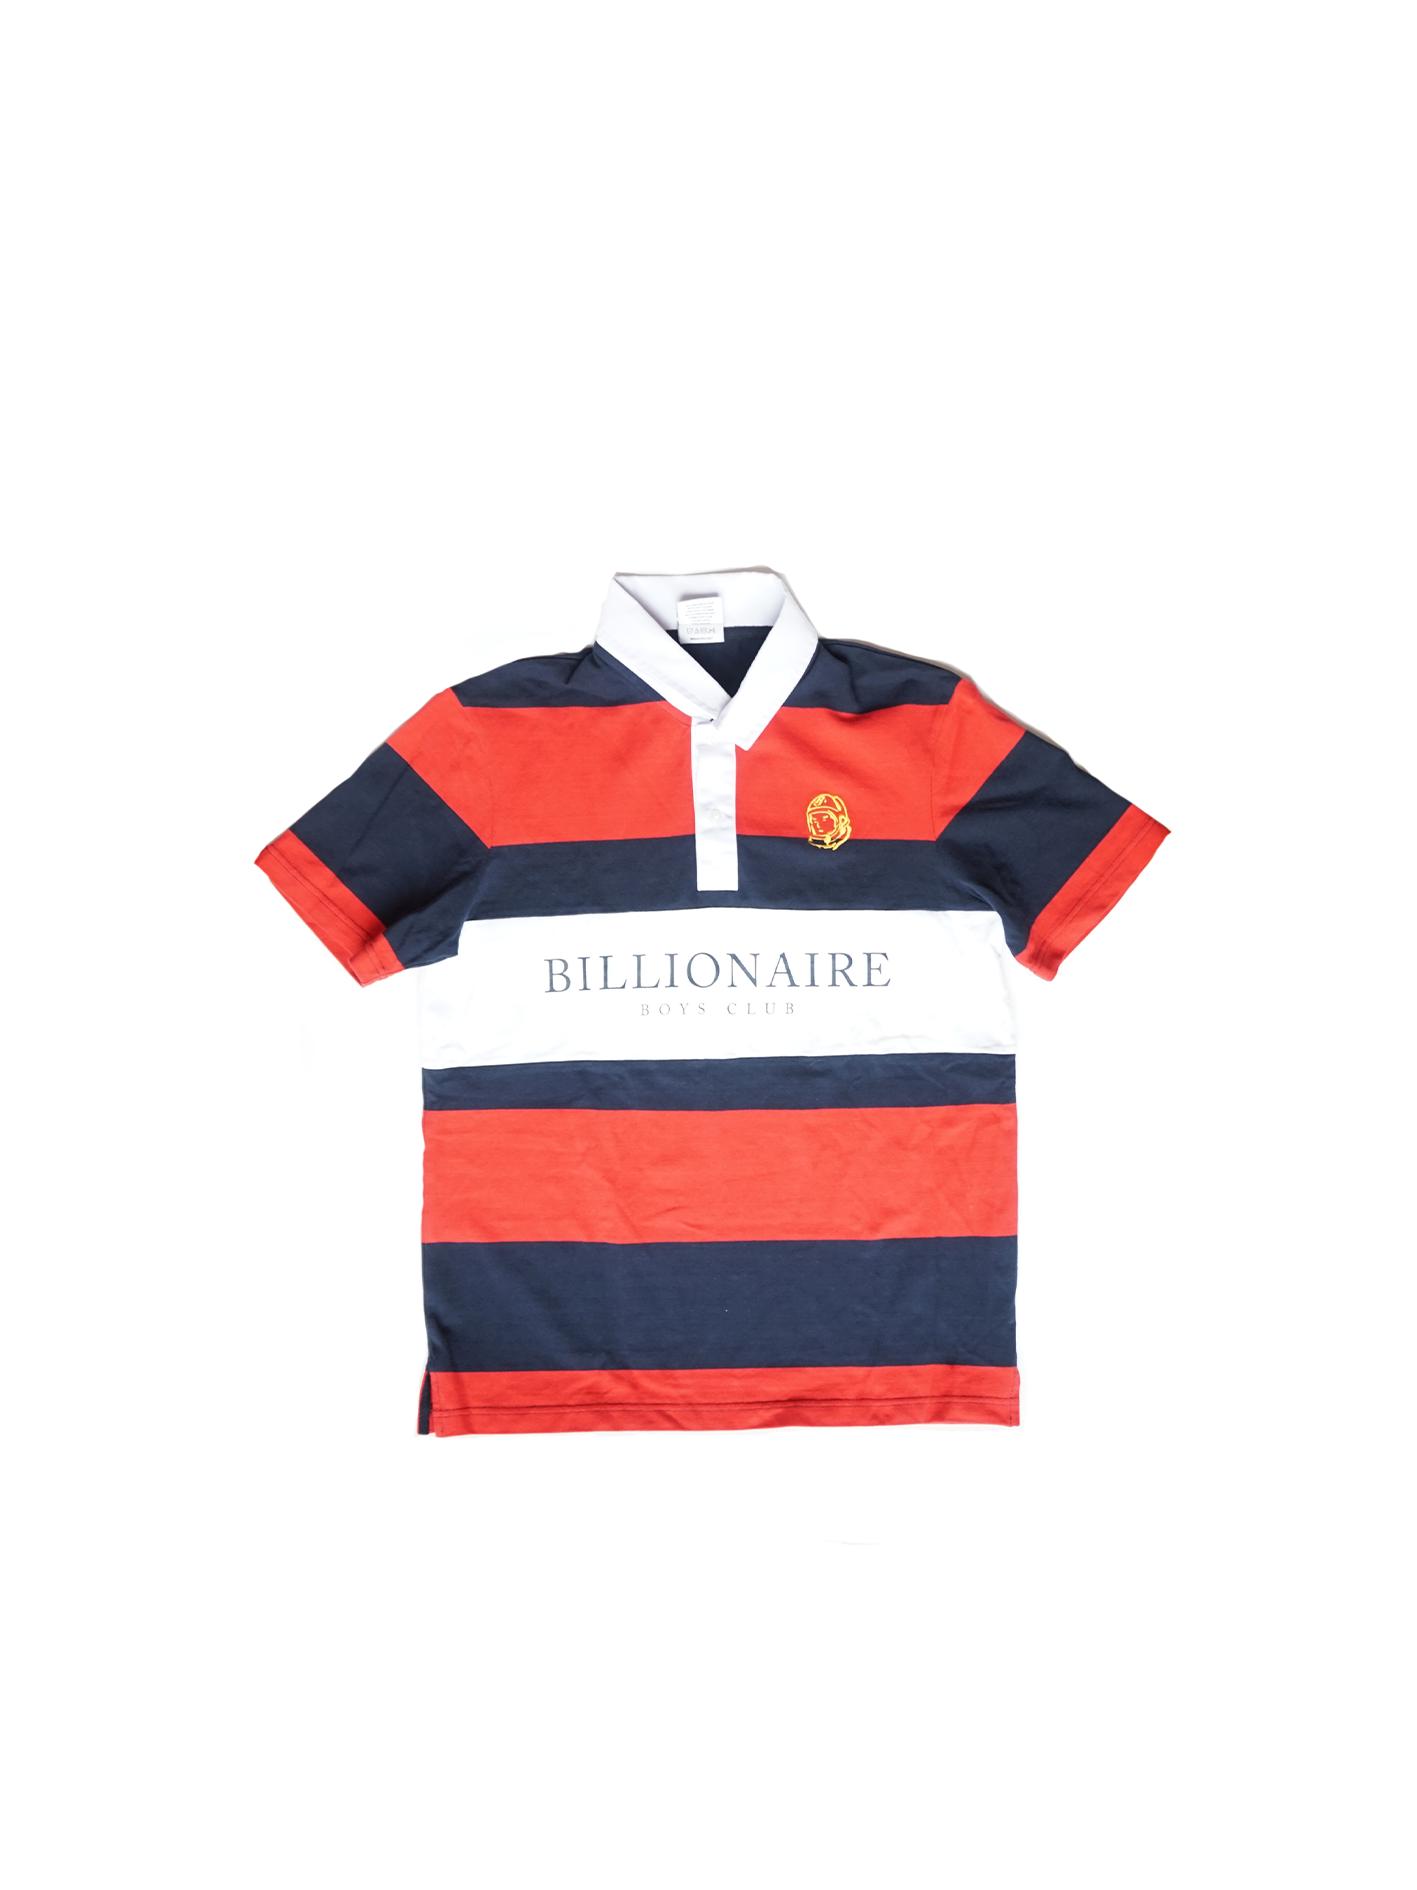 Billionaries Boys Club Polo